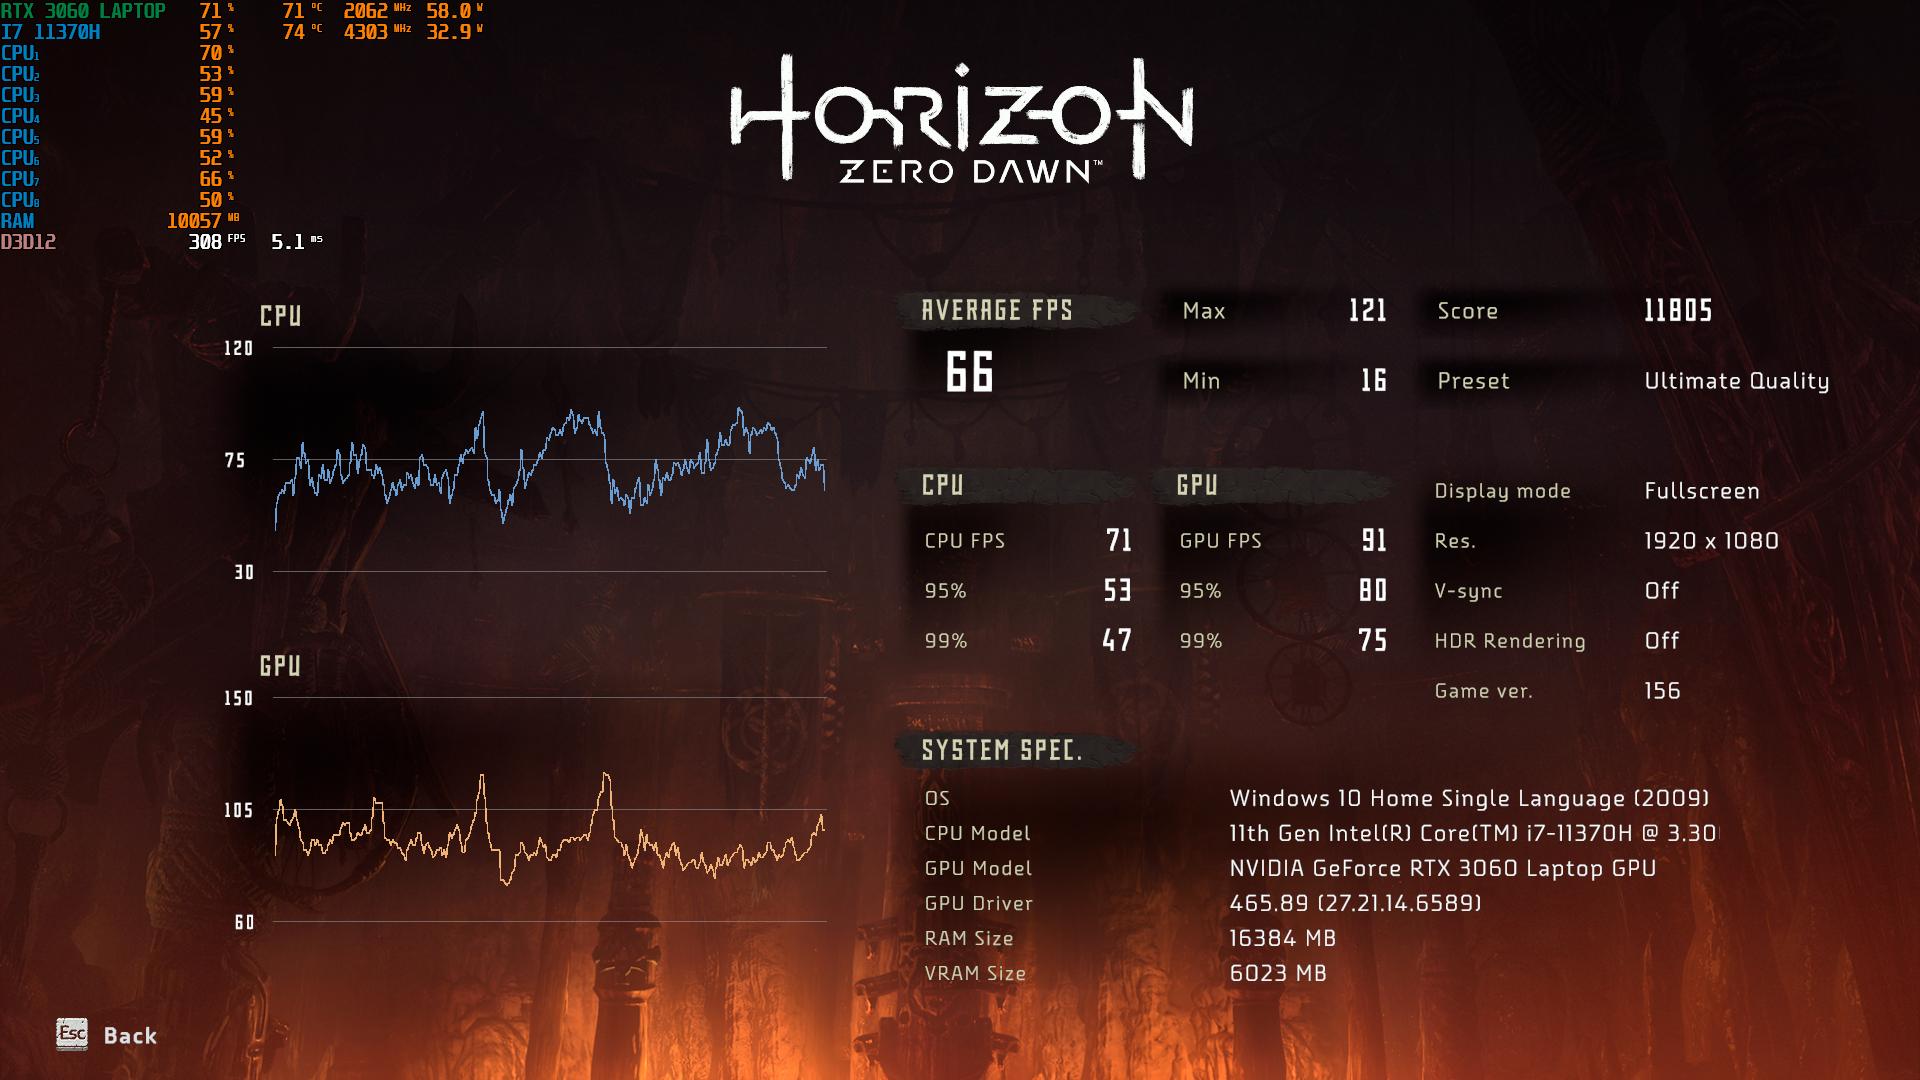 horizon-zero-dawn-complete-edition-screenshot-2021-04-06-18-15-52-33-png.13437